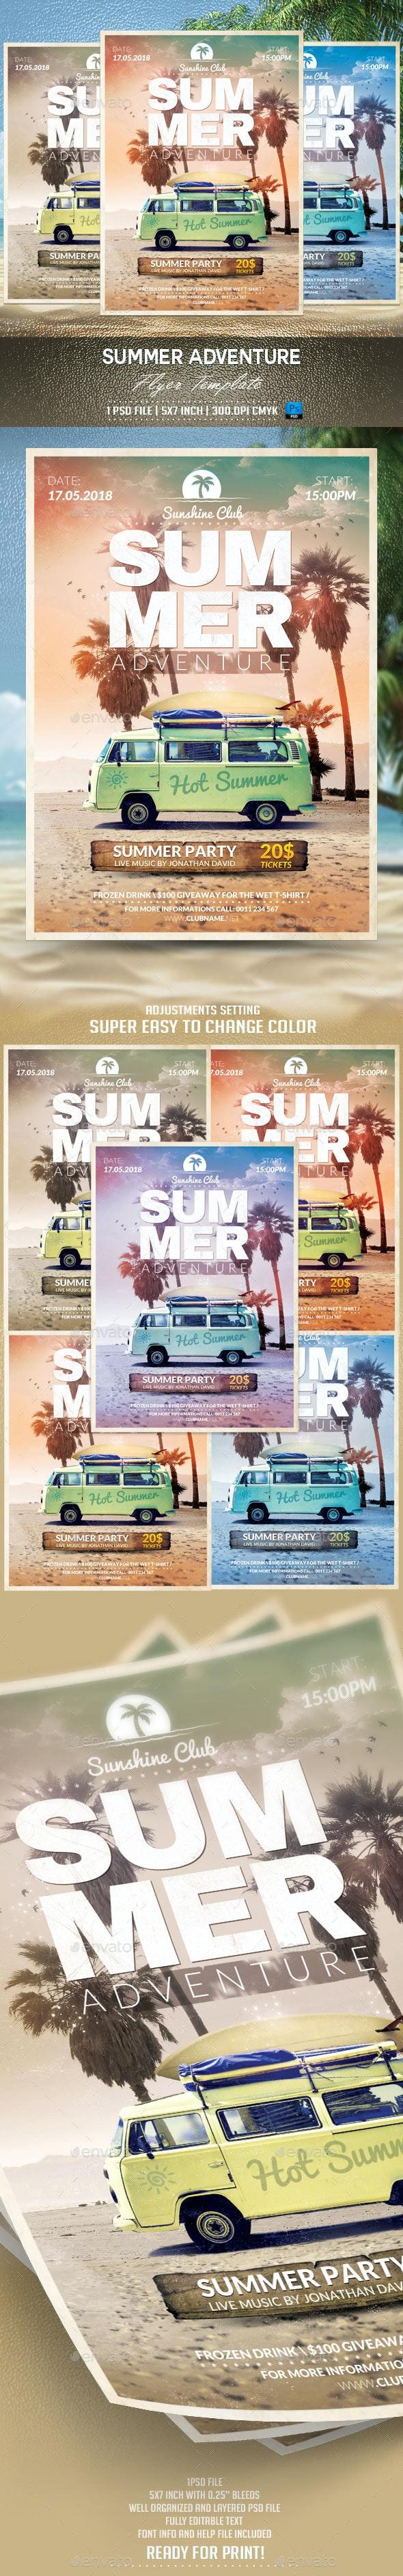 Summer Adventure Flyer Template - Events Flyers